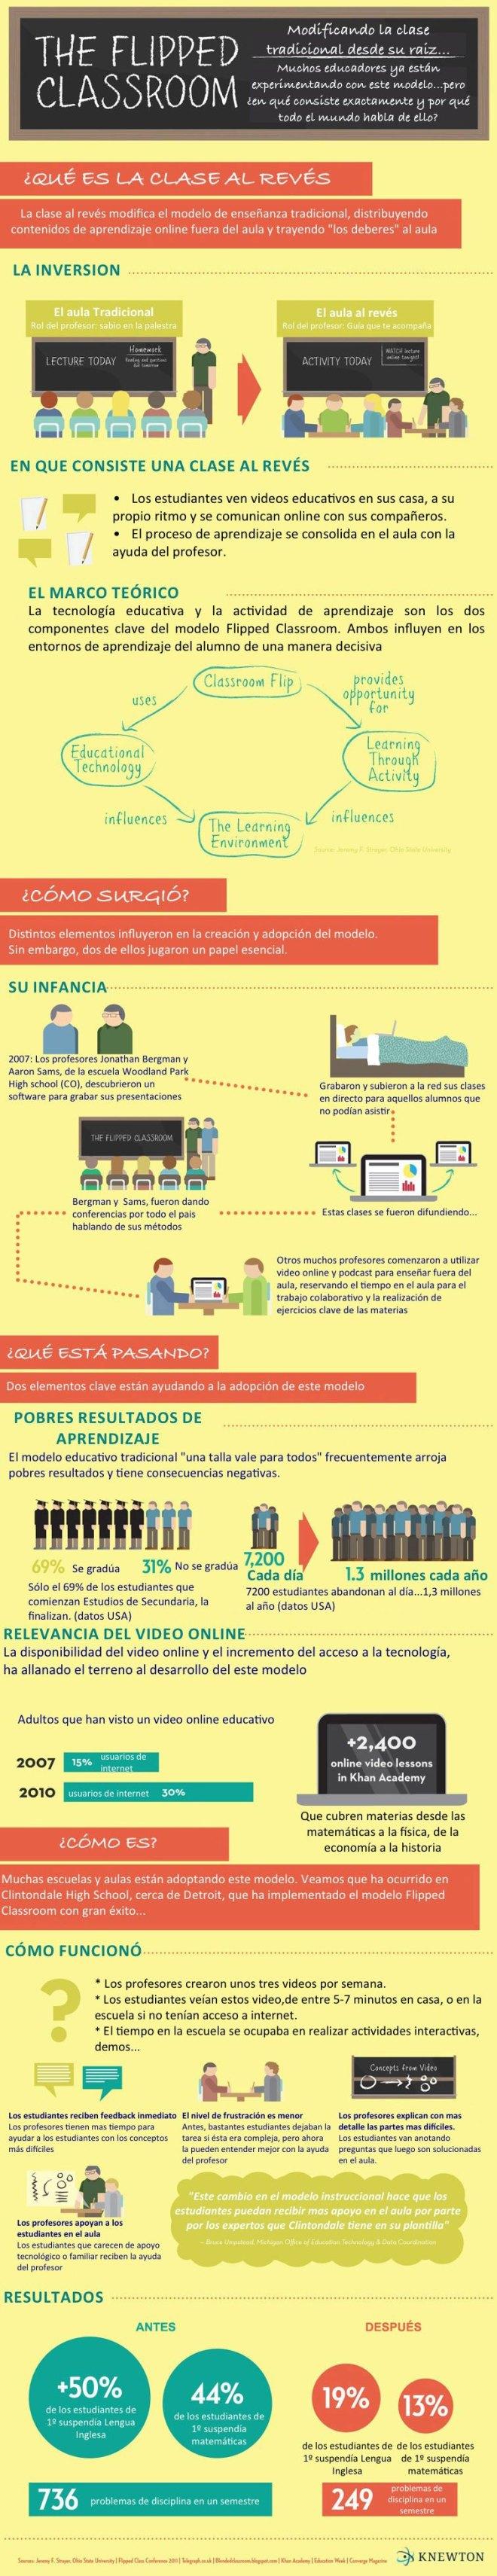 infografia_flipped_classroom